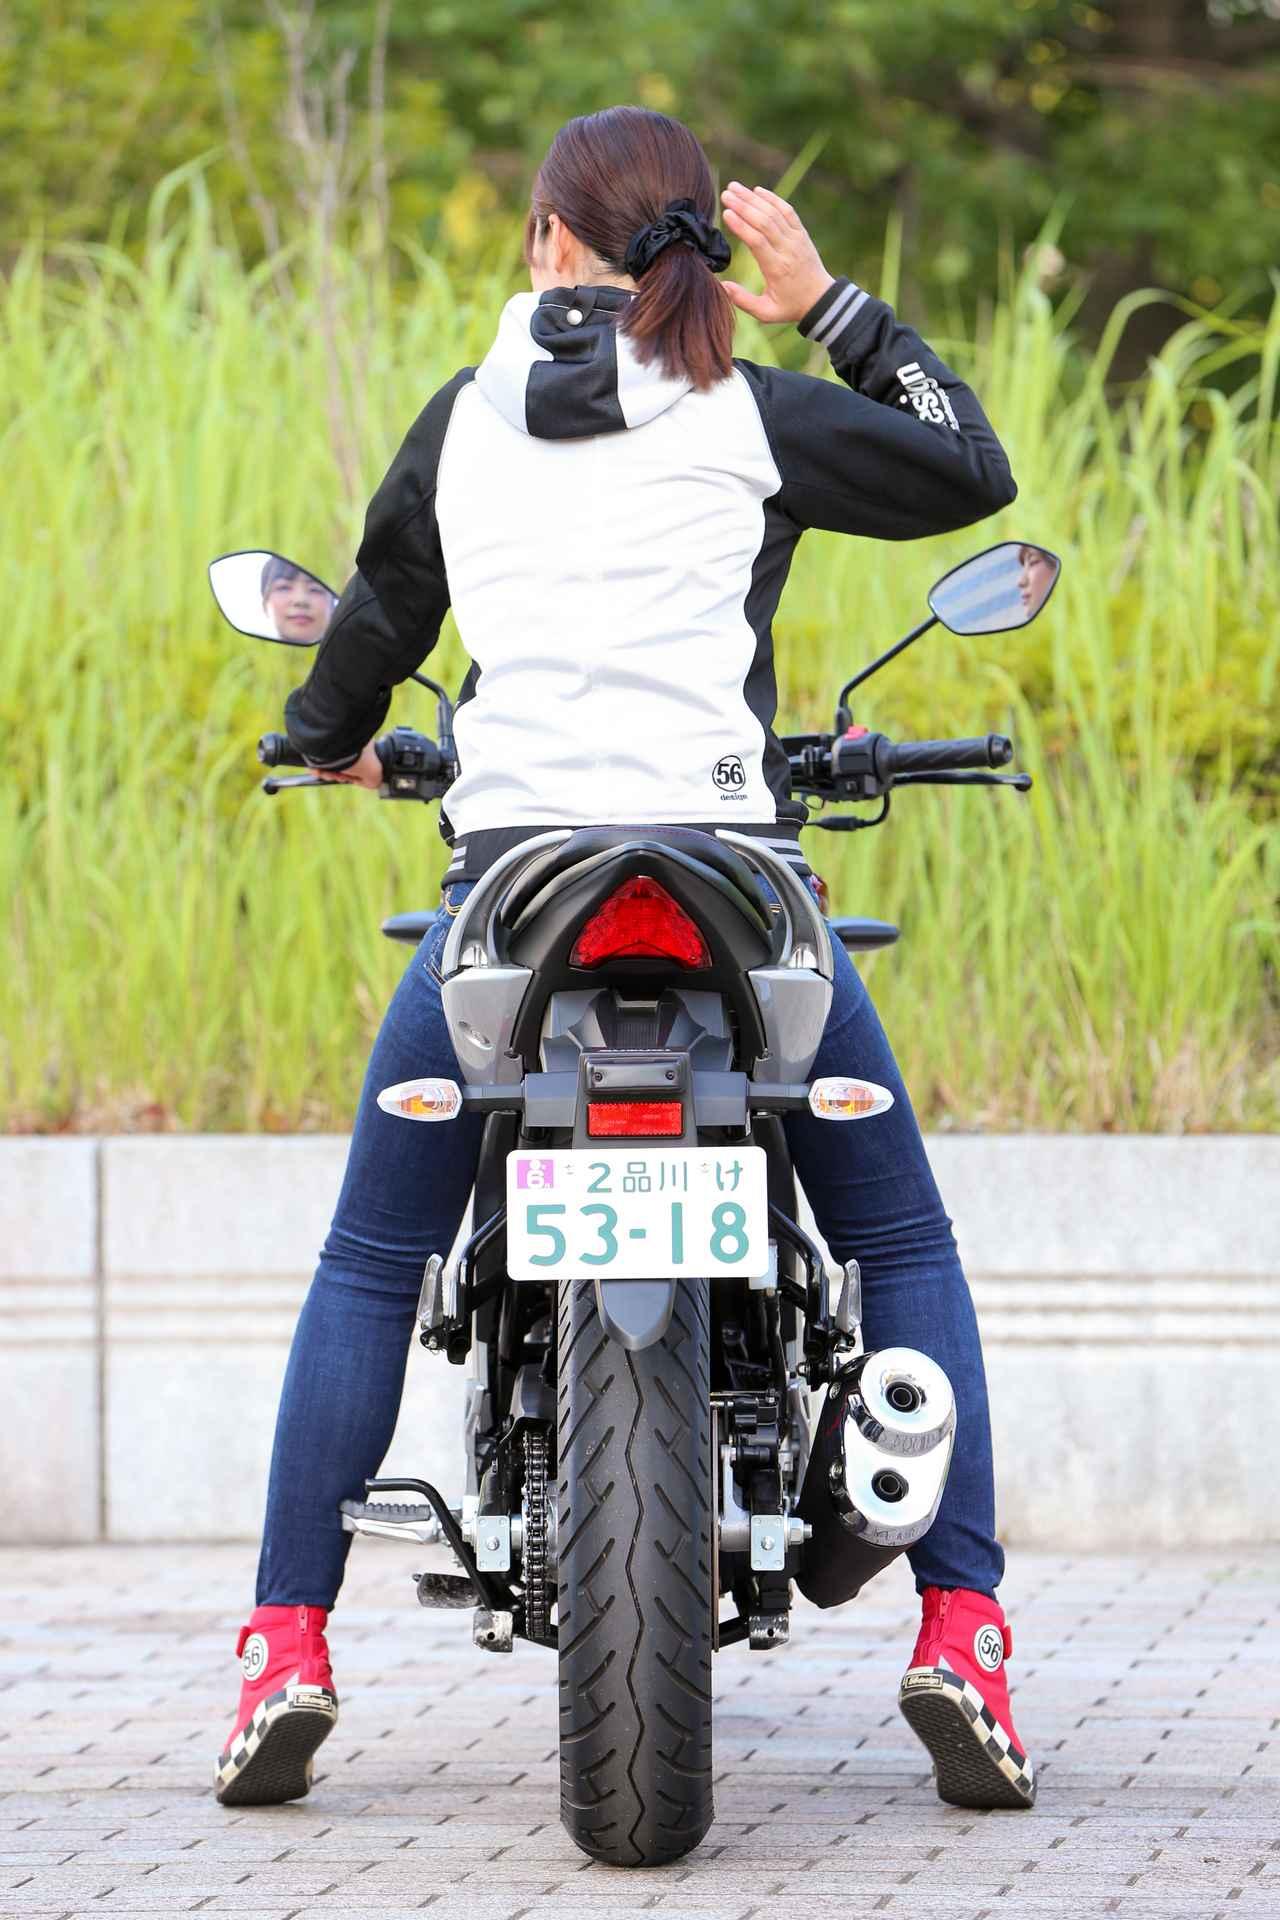 Images : 6番目の画像 - ほぼ月刊「梅本まどかとオートバイ」vol.20 SUZUKI GIXXER - webオートバイ